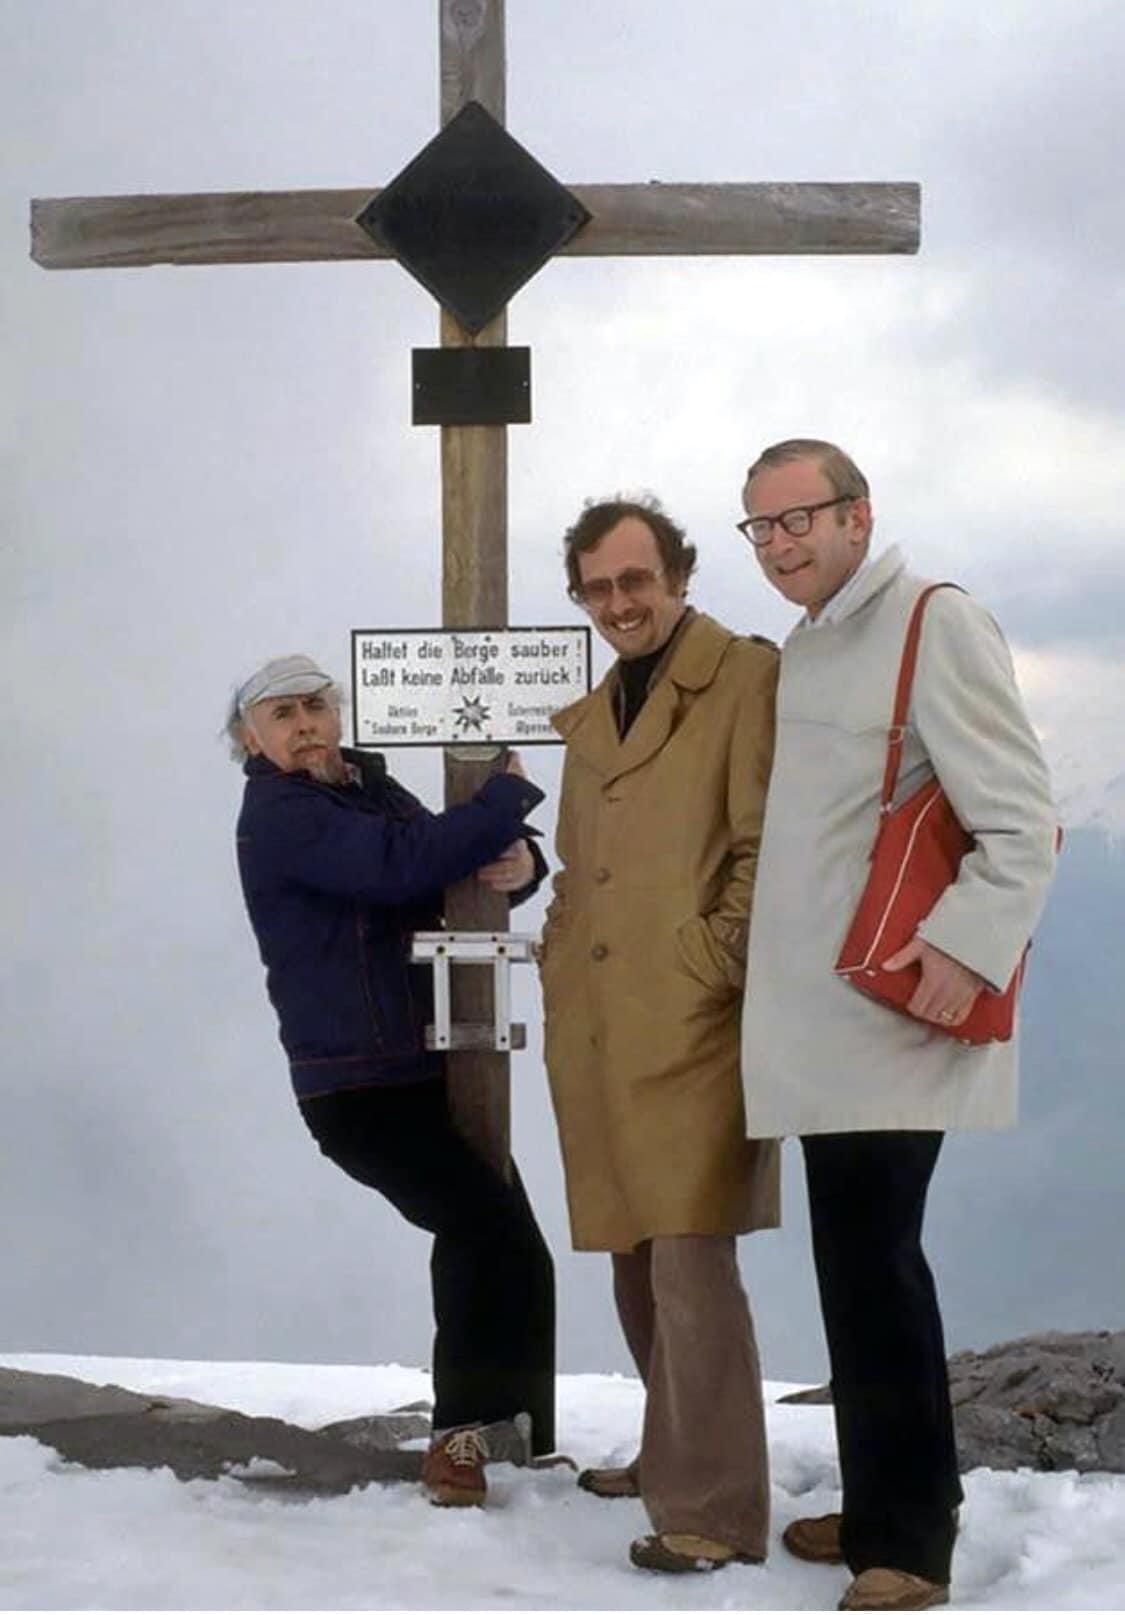 Irvin Kauffman, Charles Hardwick and Ray Marsh in Austria, 1978